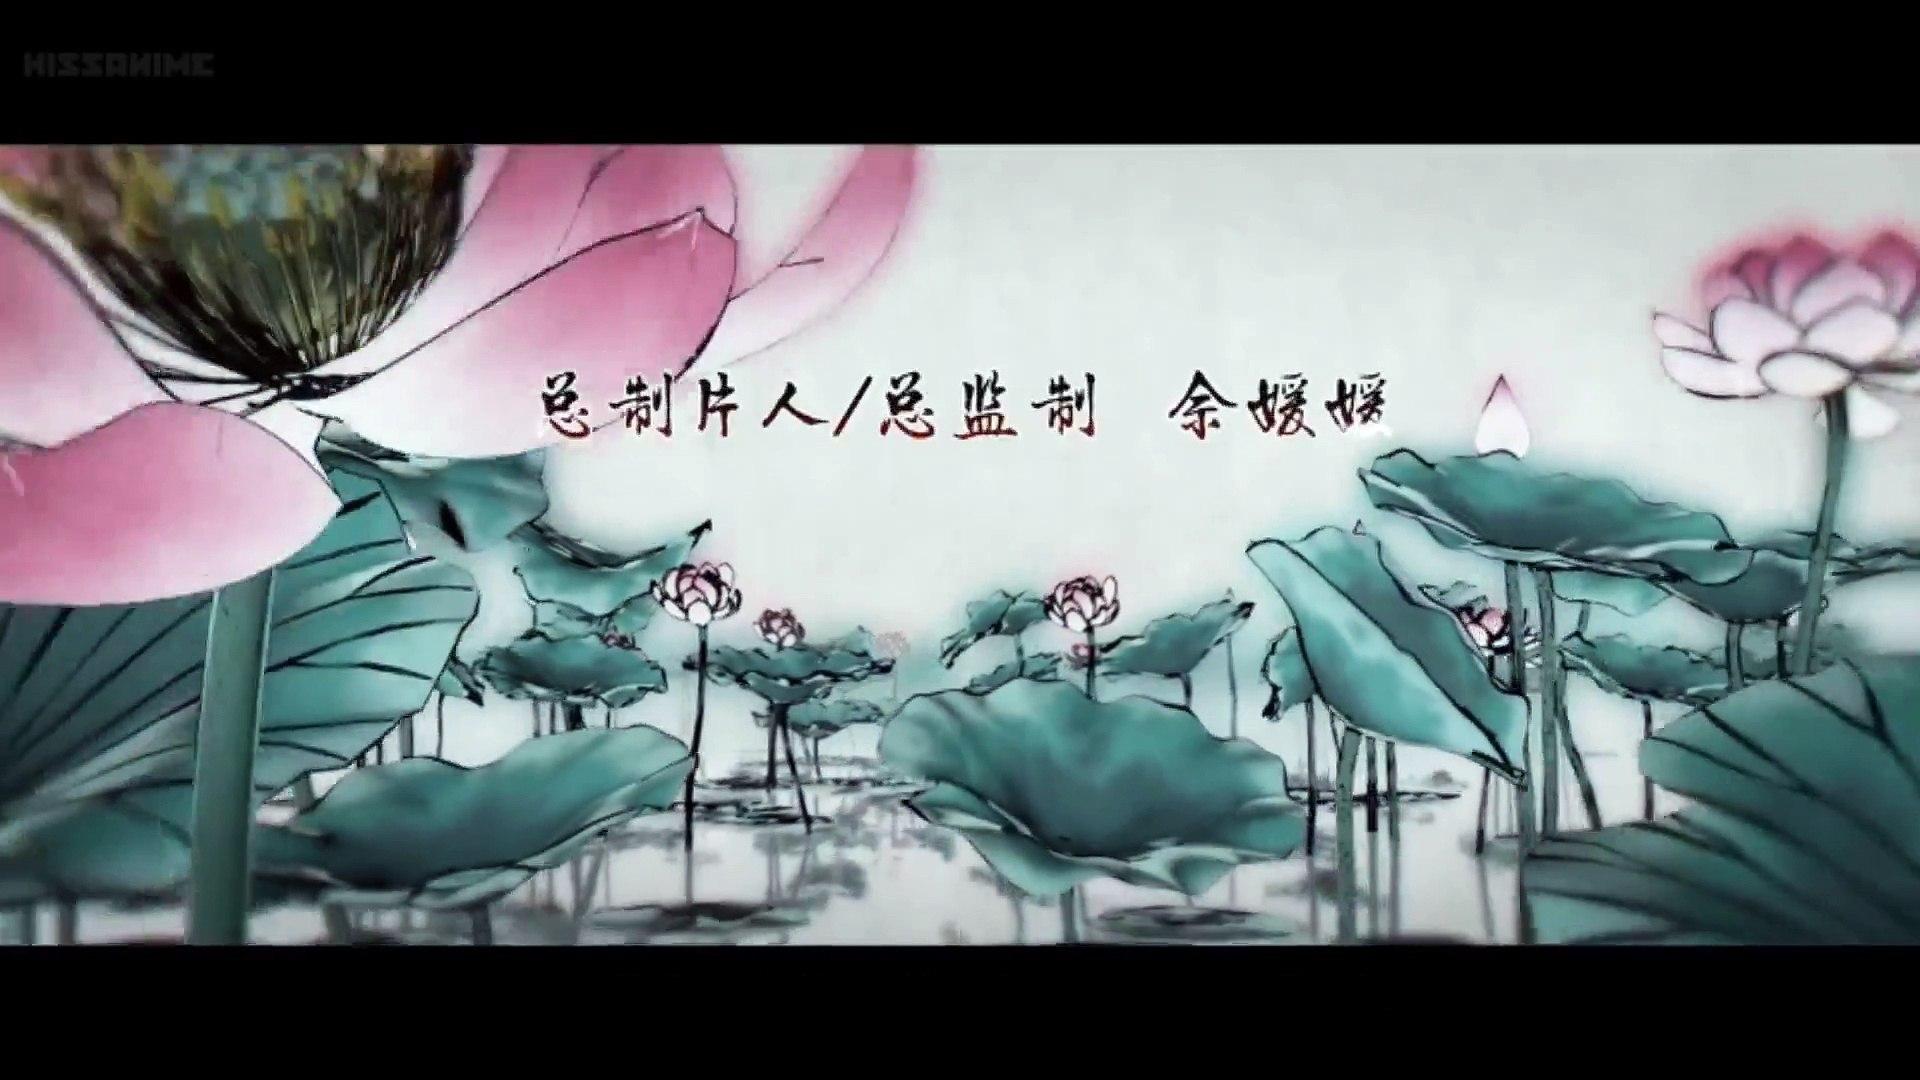 Mo Dao Zu Shi 魔道祖师 Grandmaster Of Demonic Cultivation